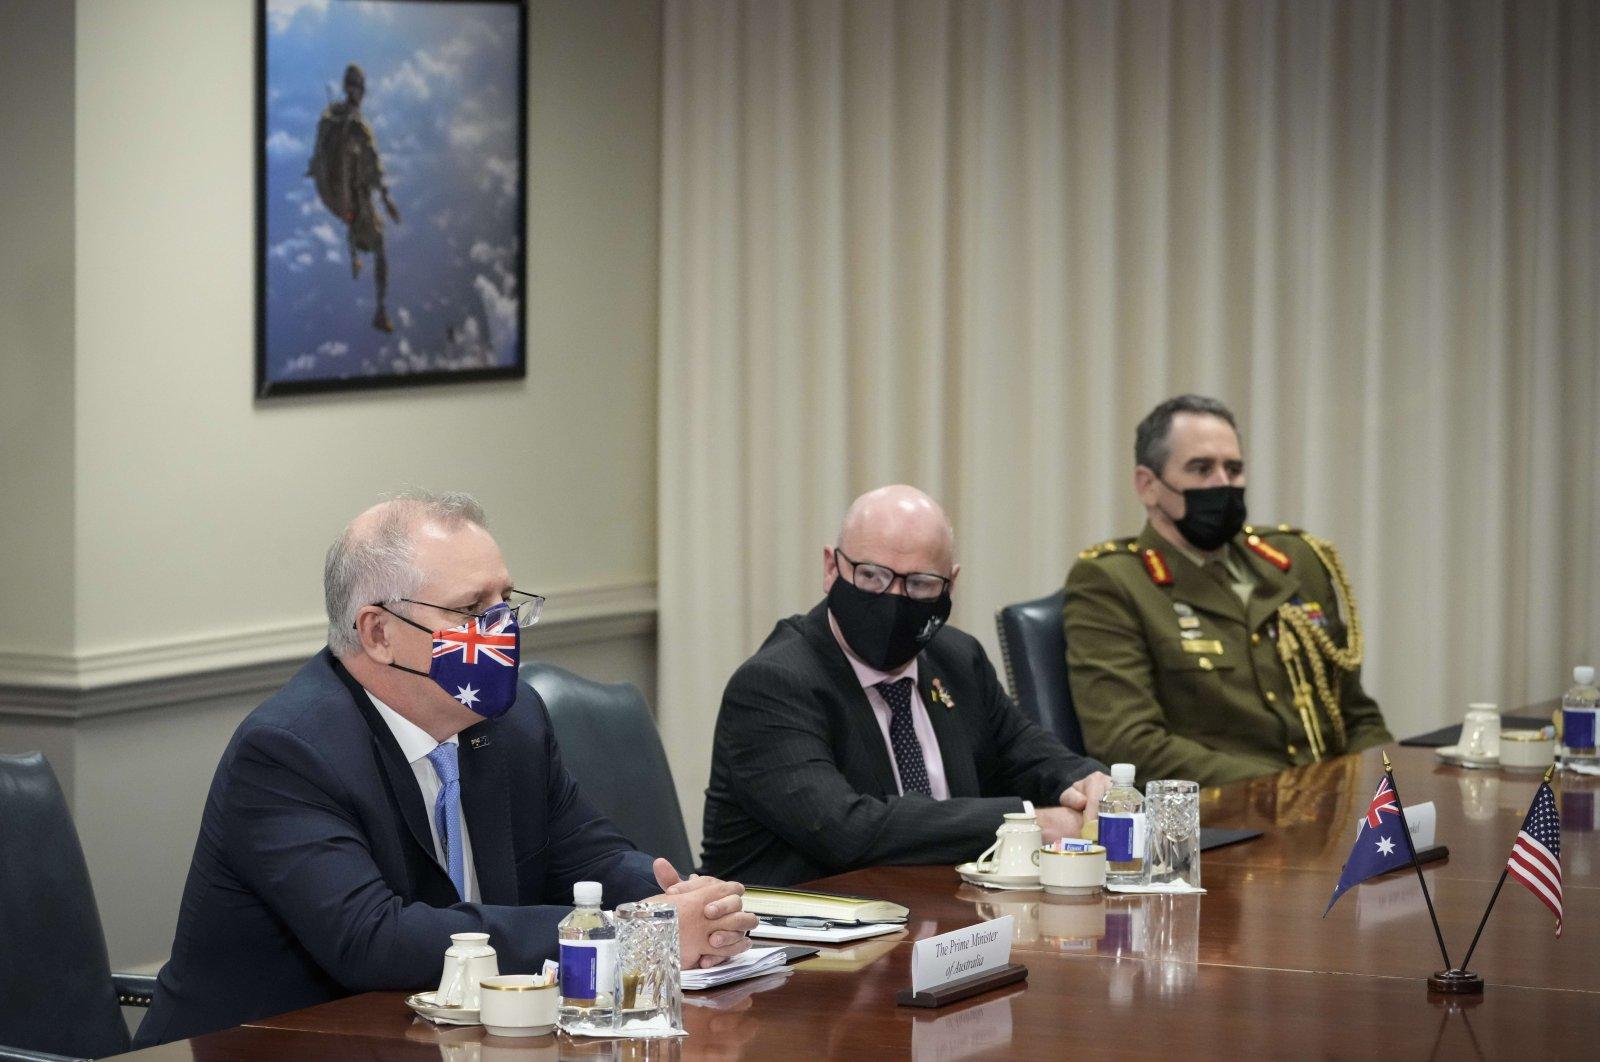 Prime Minister of Australia Scott Morrison (L) speaks during a meeting with U.S. Secretary of Defense Lloyd Austin at the Pentagon in Arlington, Virginia, U.S., Sept. 22, 2021 (Getty Images Photo)